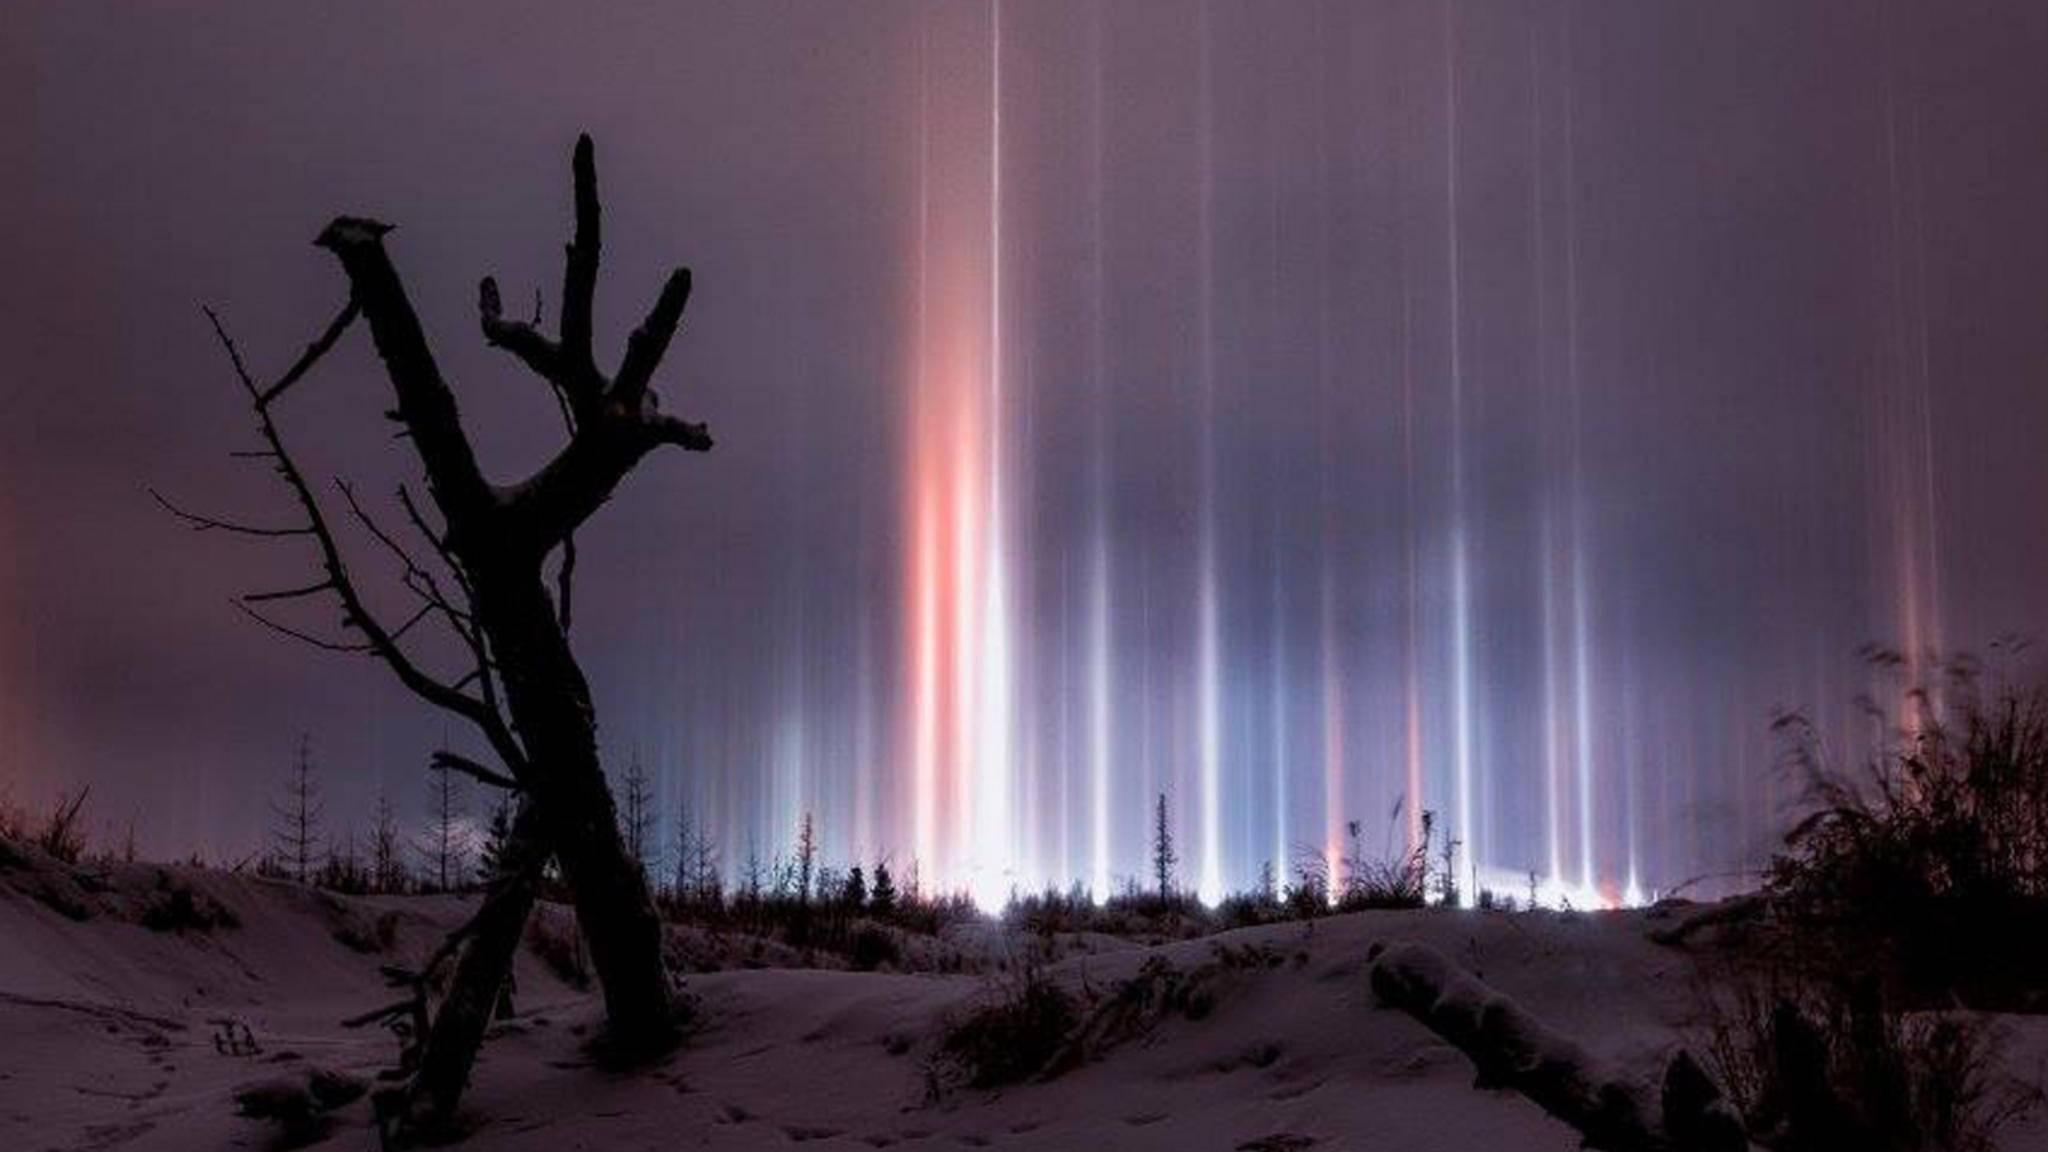 Dieses beeindruckende Naturphänomen war Anfang November in Russland zu beobachten.